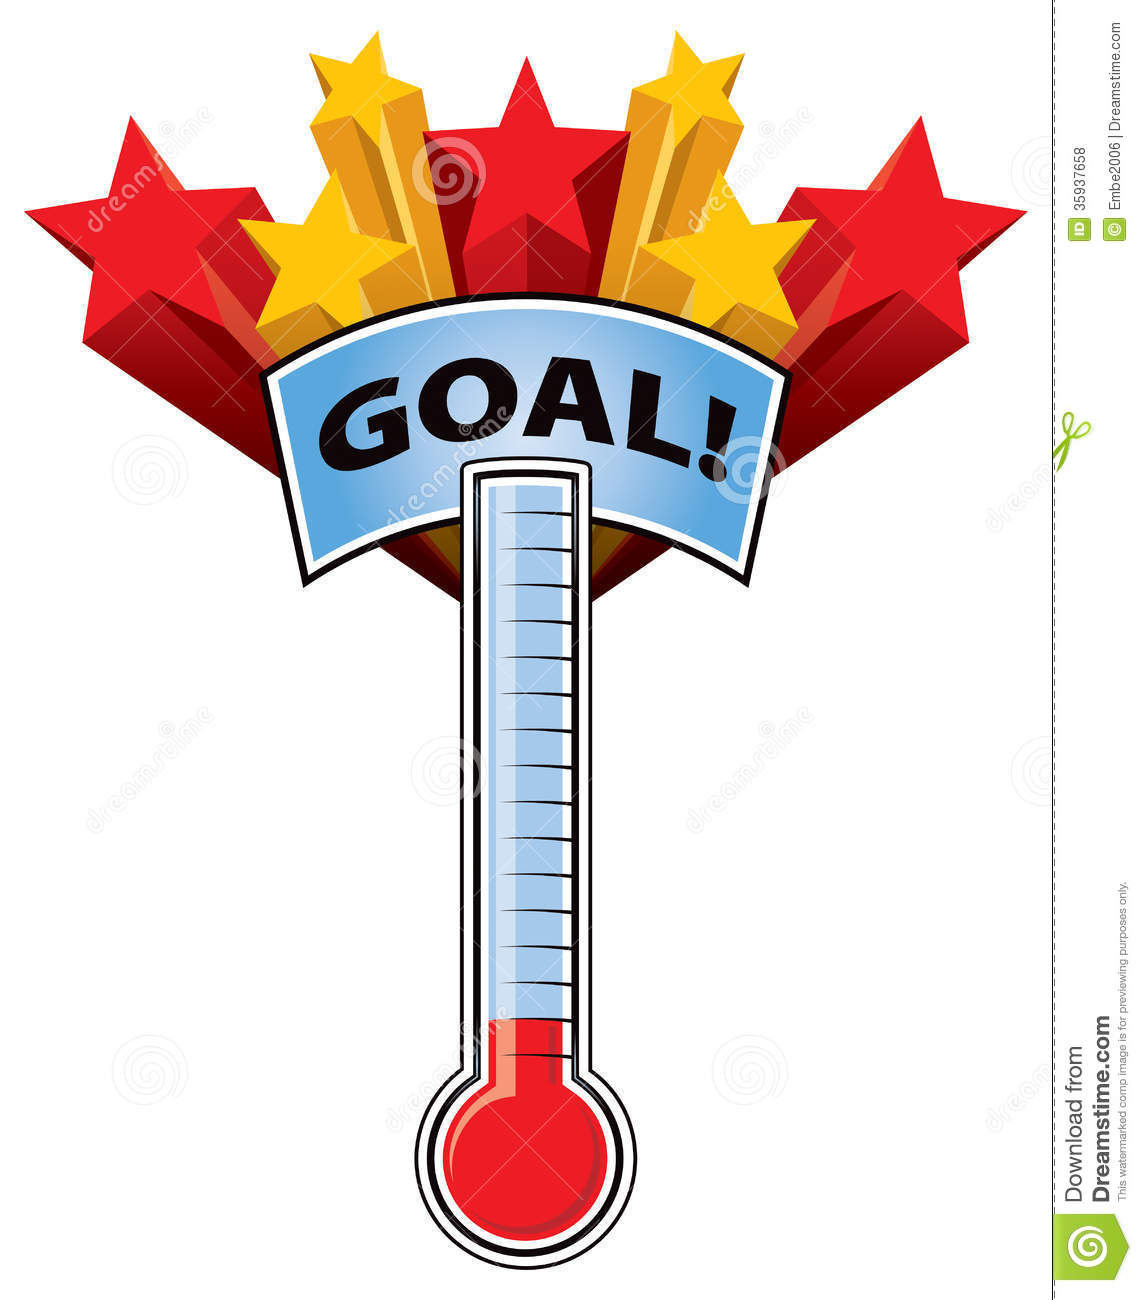 Fundraiser Goal Clipart-Fundraiser Goal Clipart-7